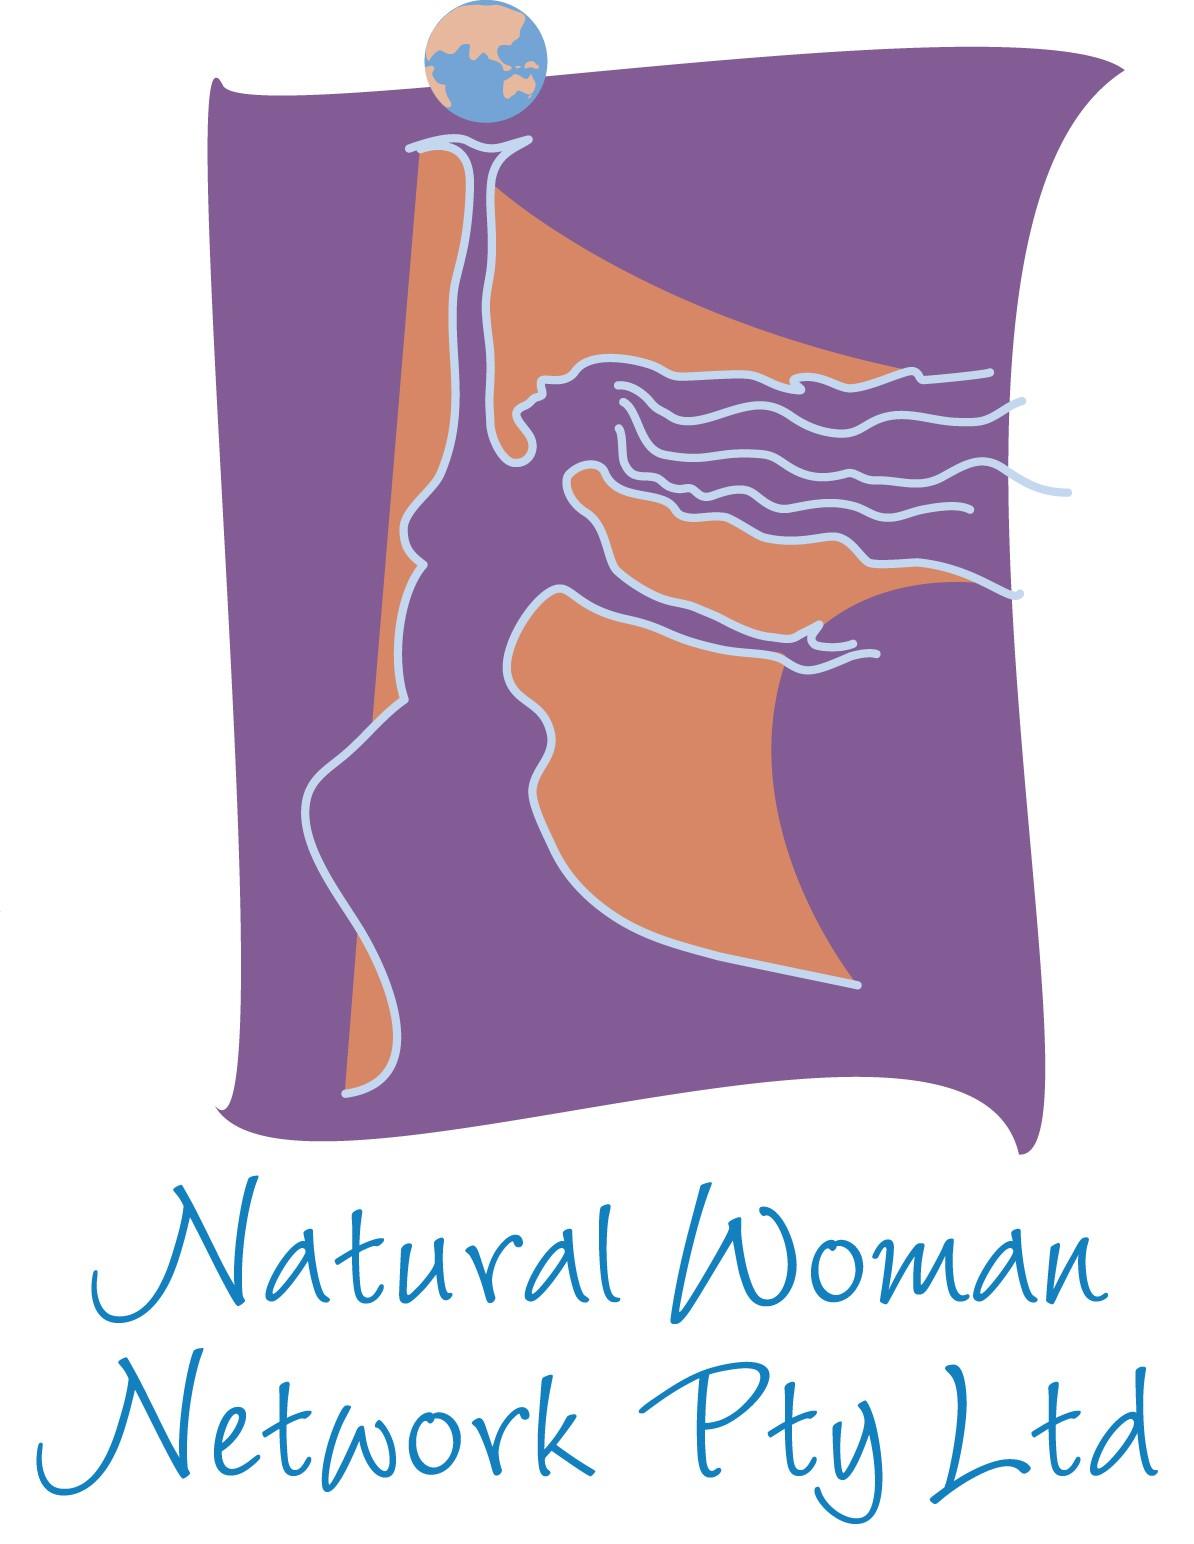 Natural Woman Network